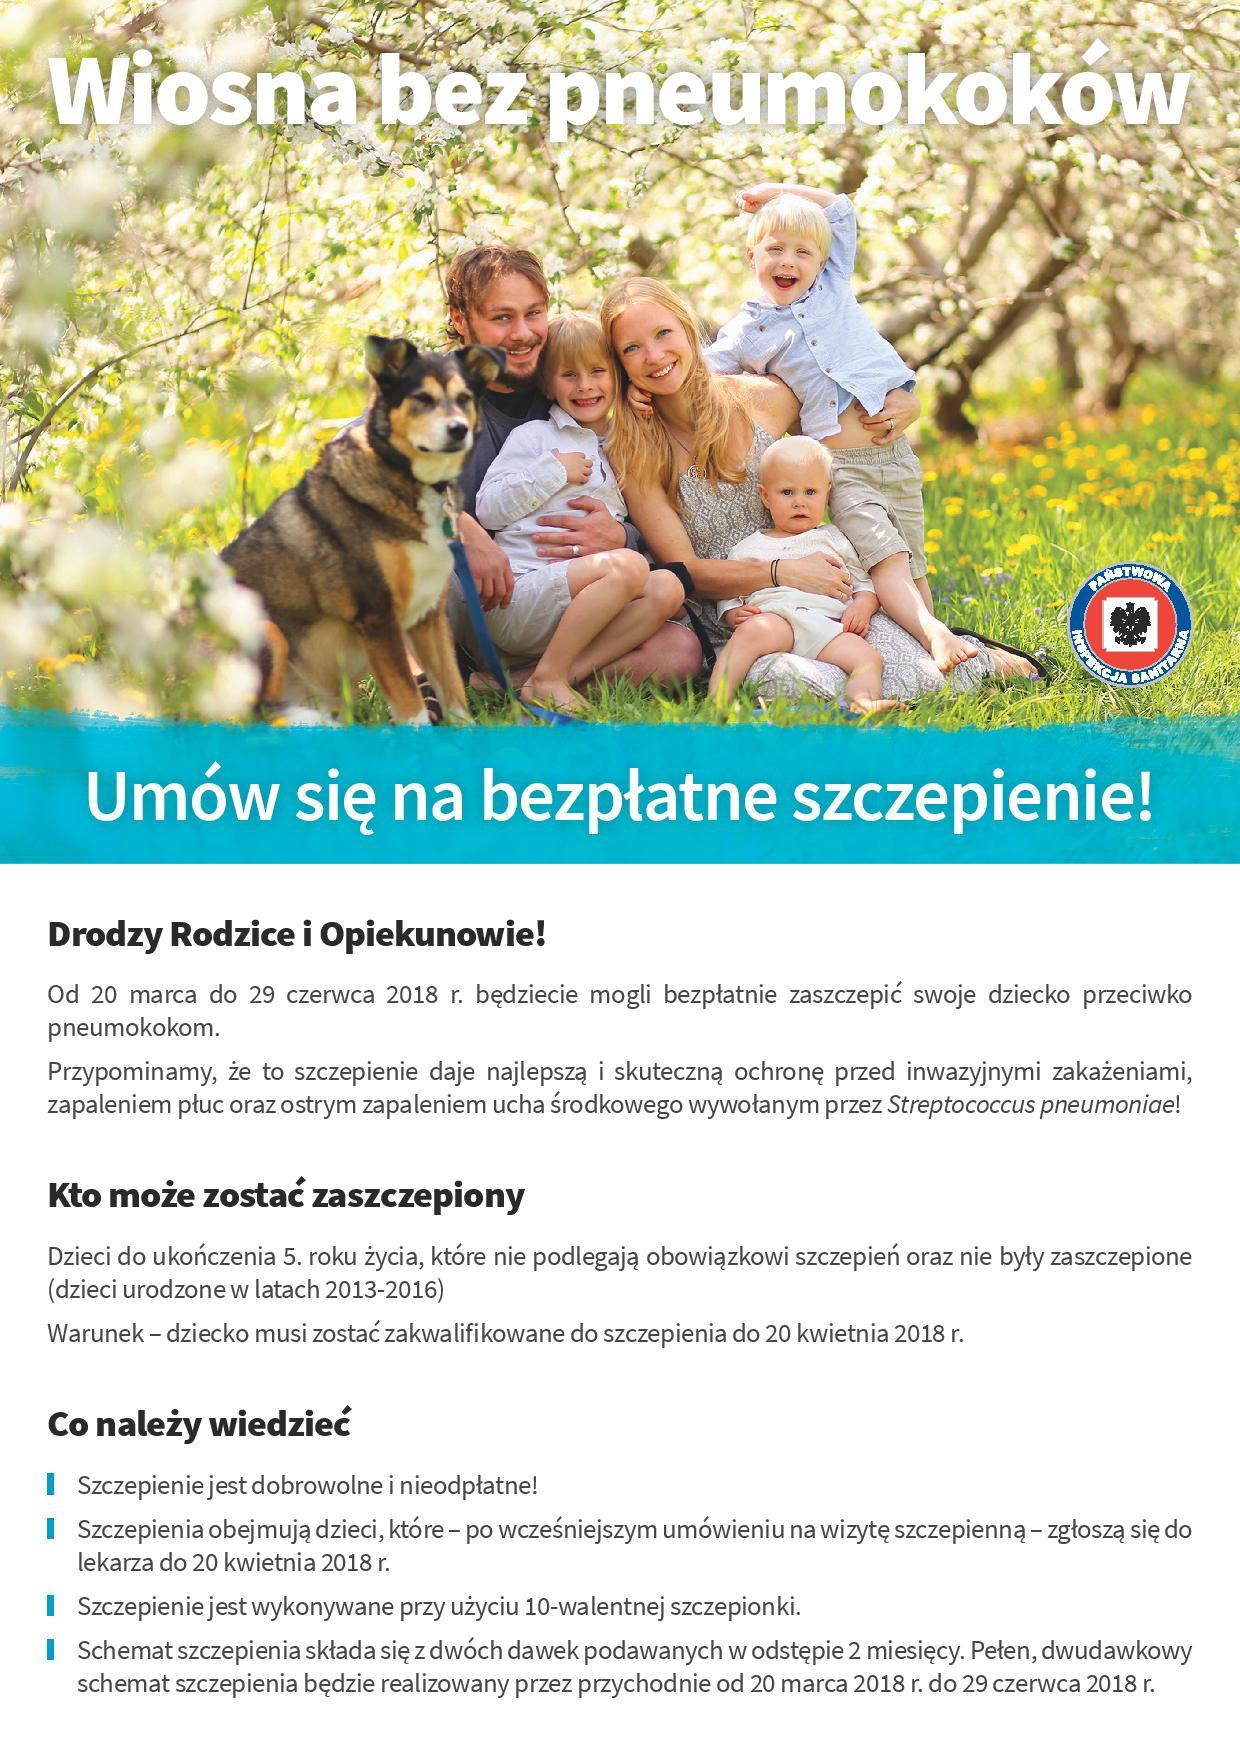 http://m.82-200.pl/2018/03/orig/plakat-pneumokoki-a4-druk-page-001-2642.jpg